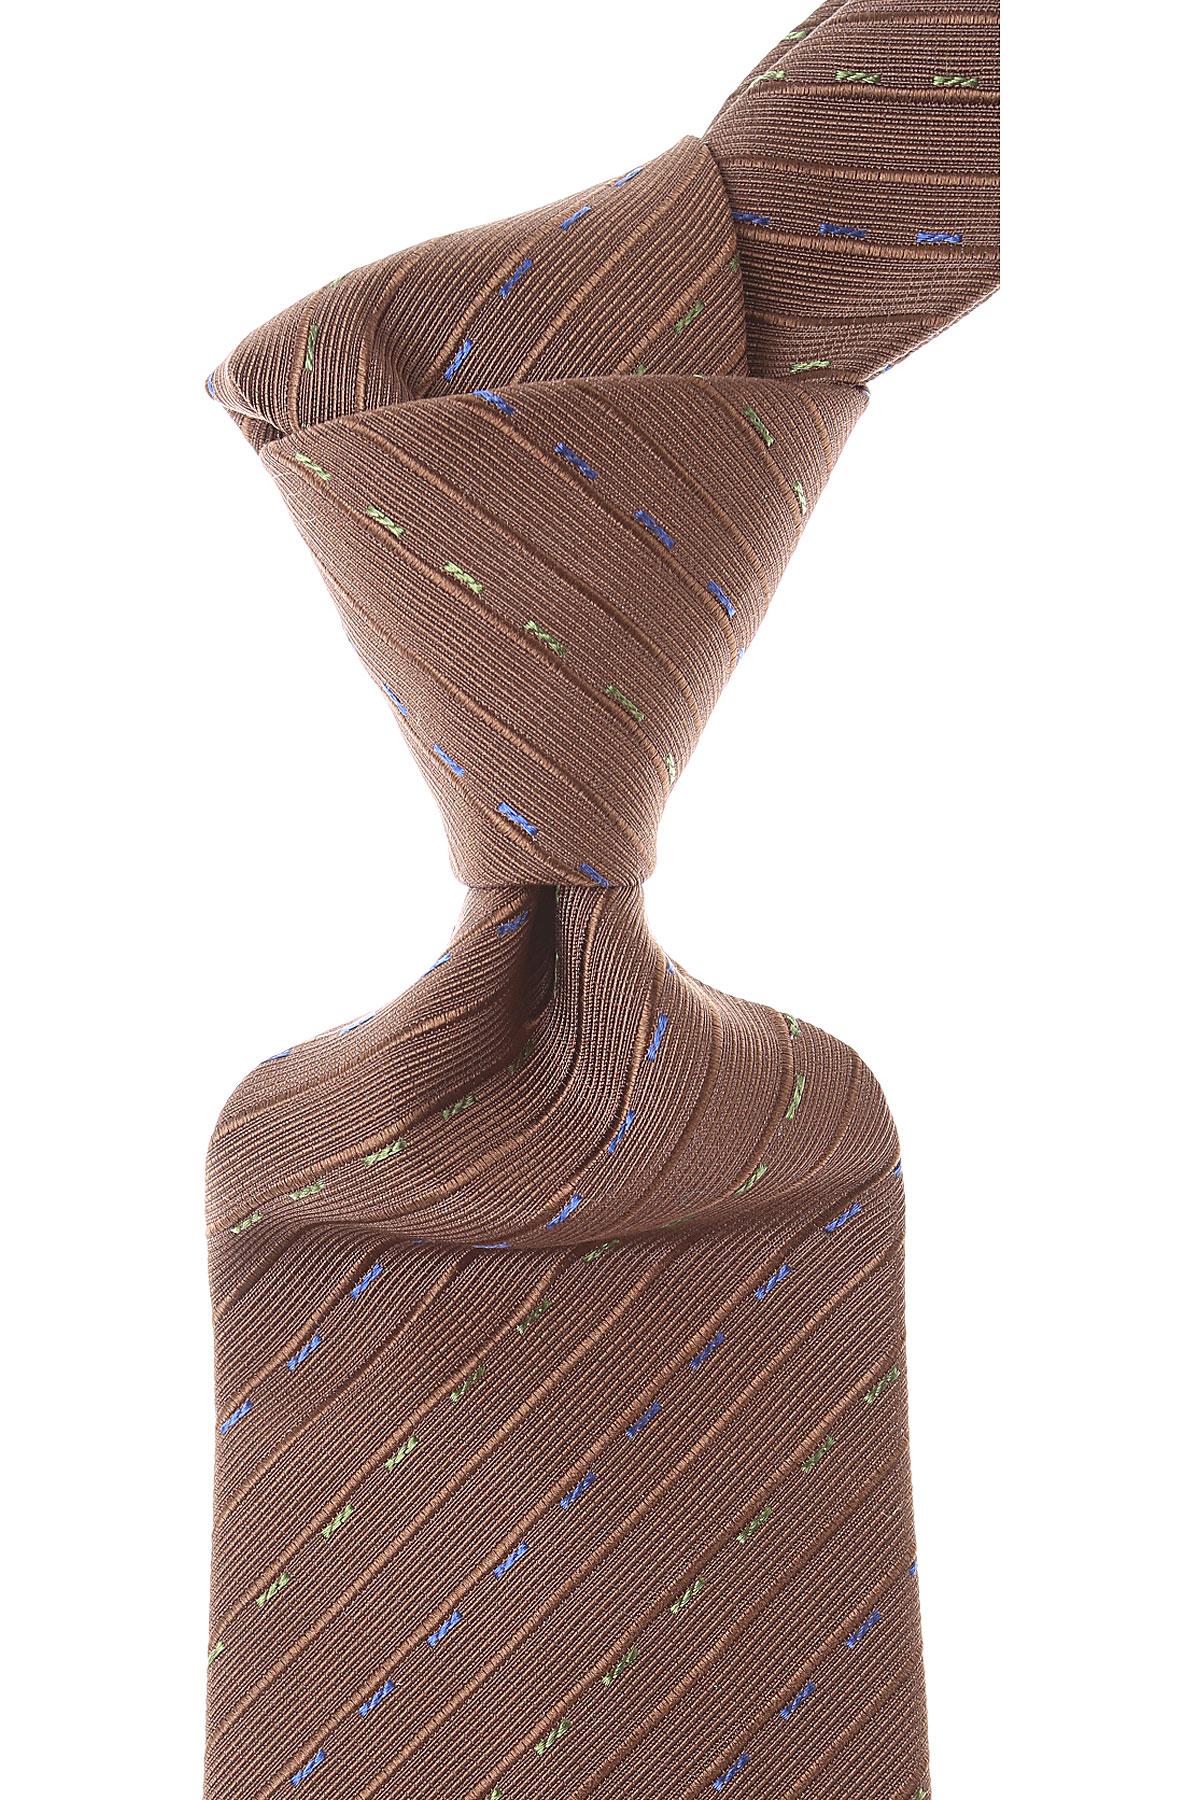 Valentino Cravates Pas cher en Soldes, Brun chocolat, Soie, 2021